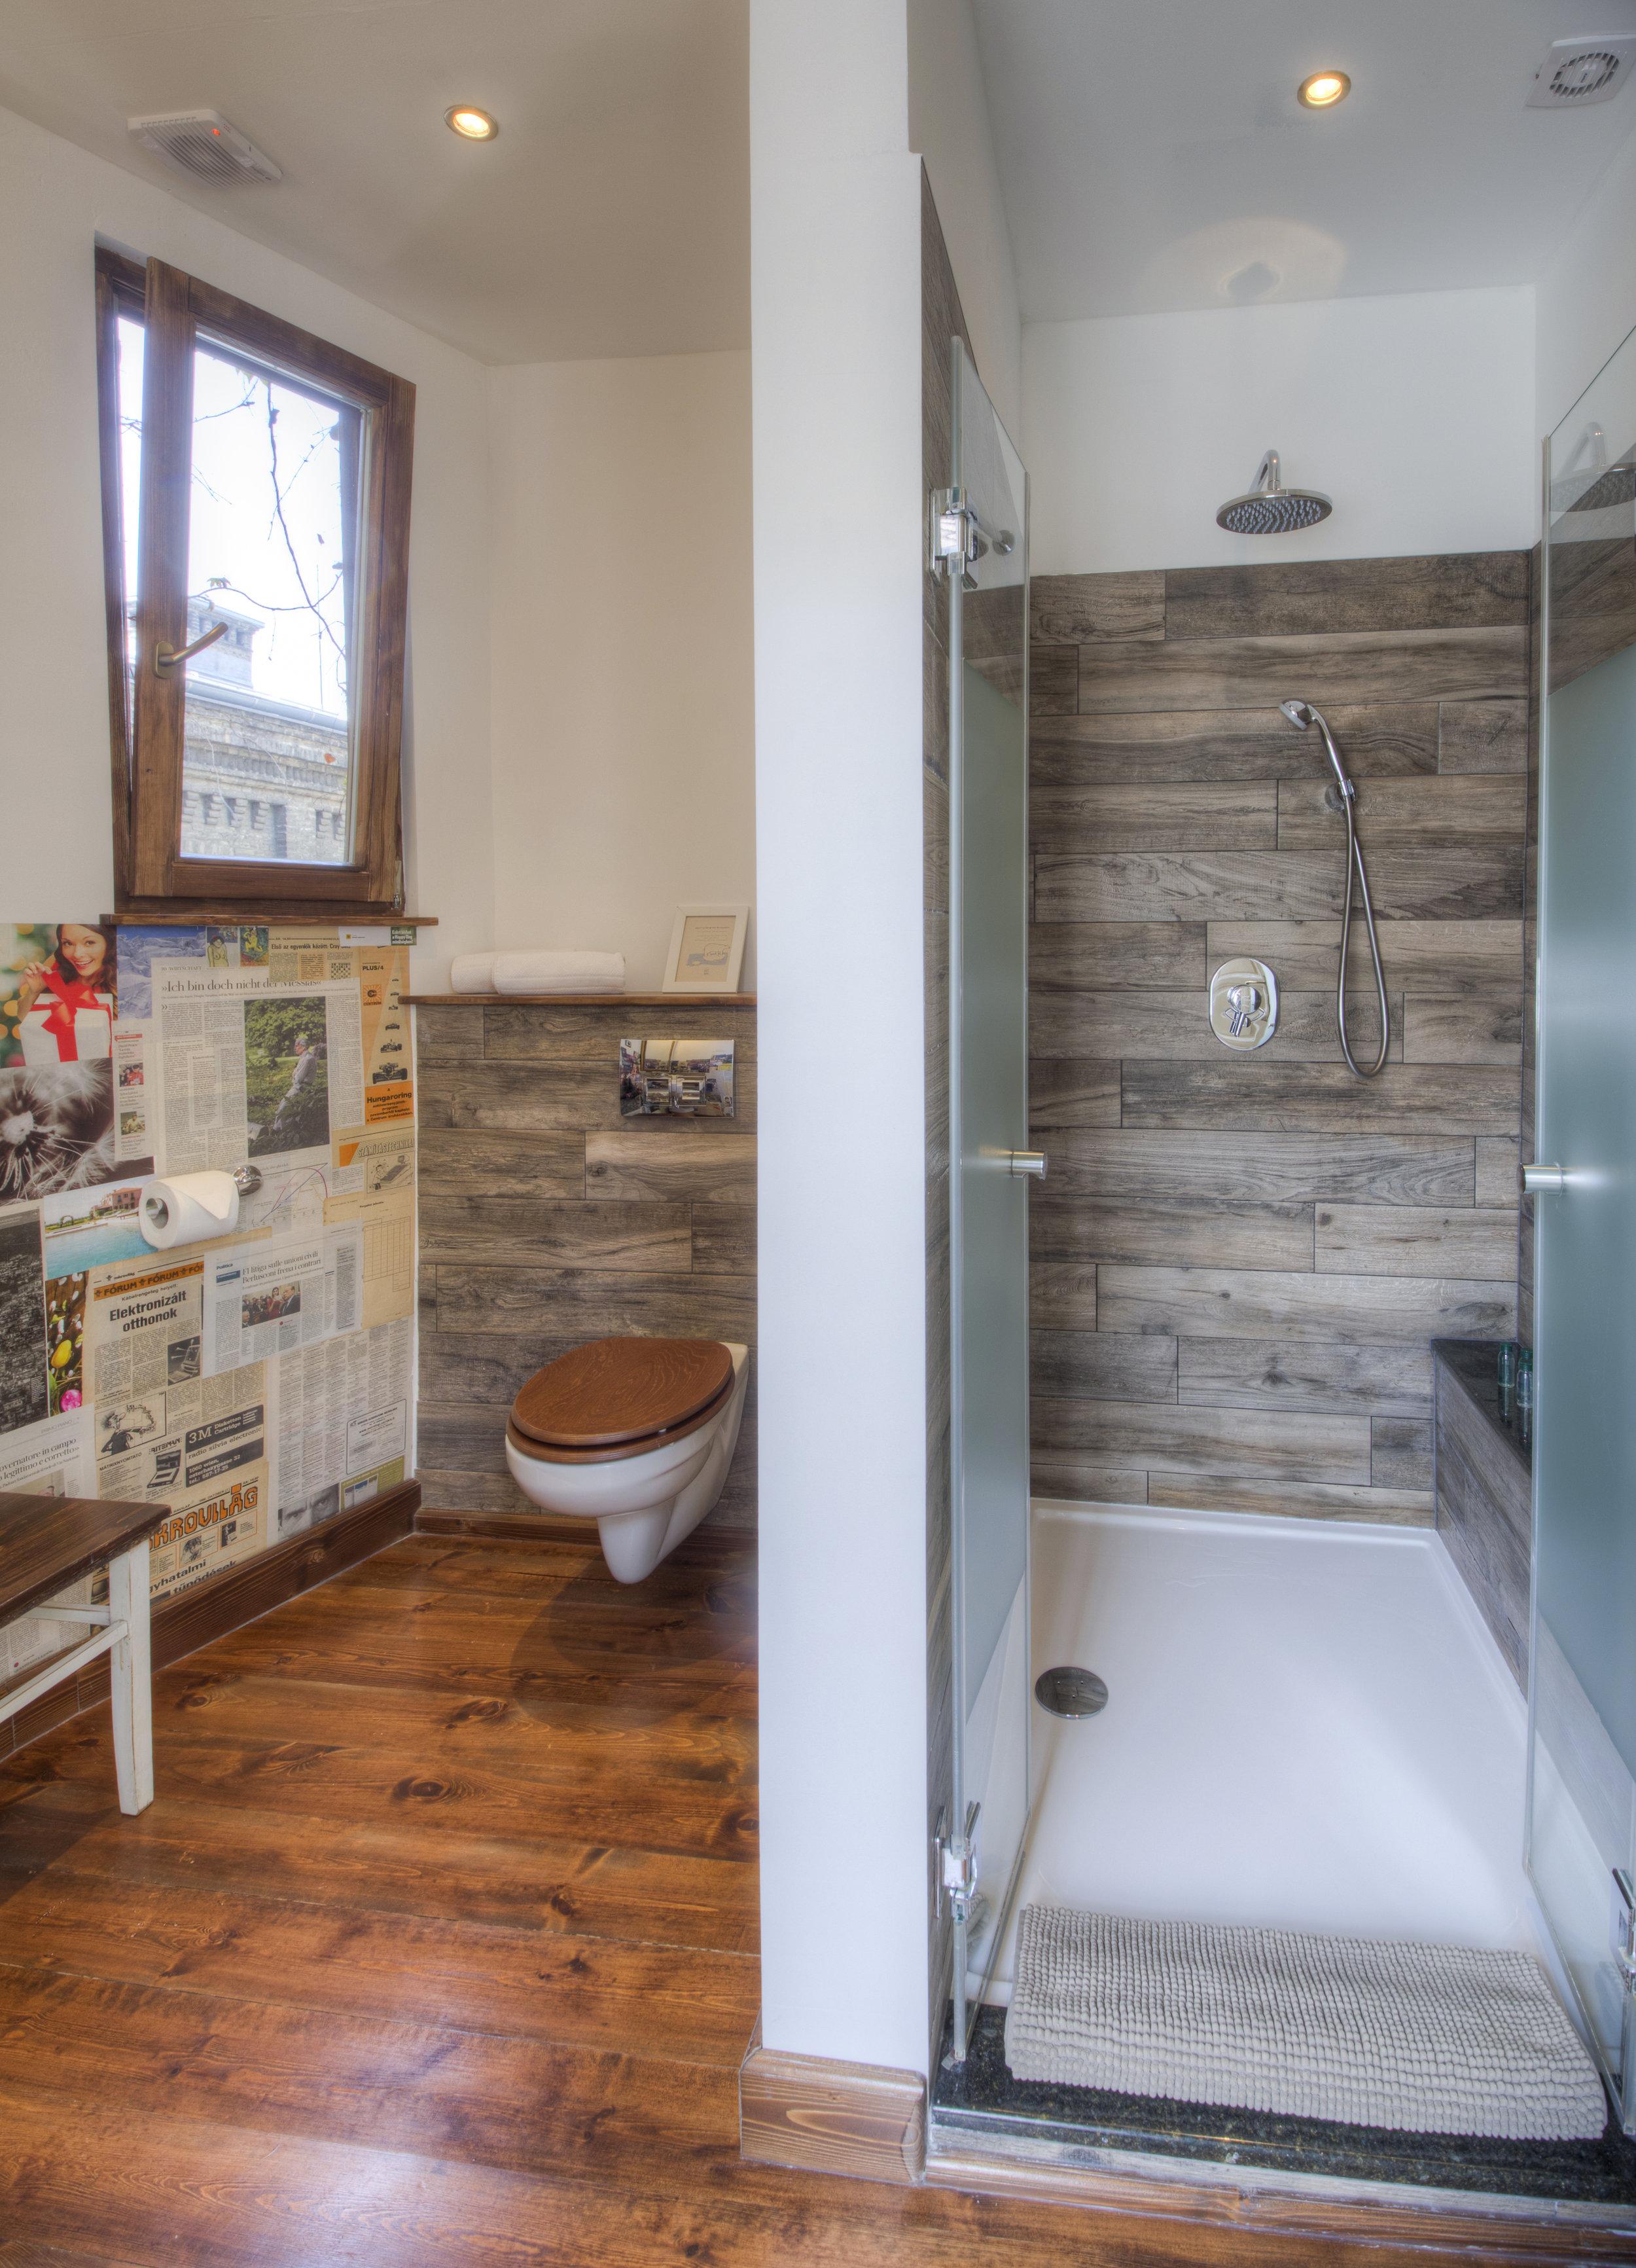 Judit_bathroom.jpg